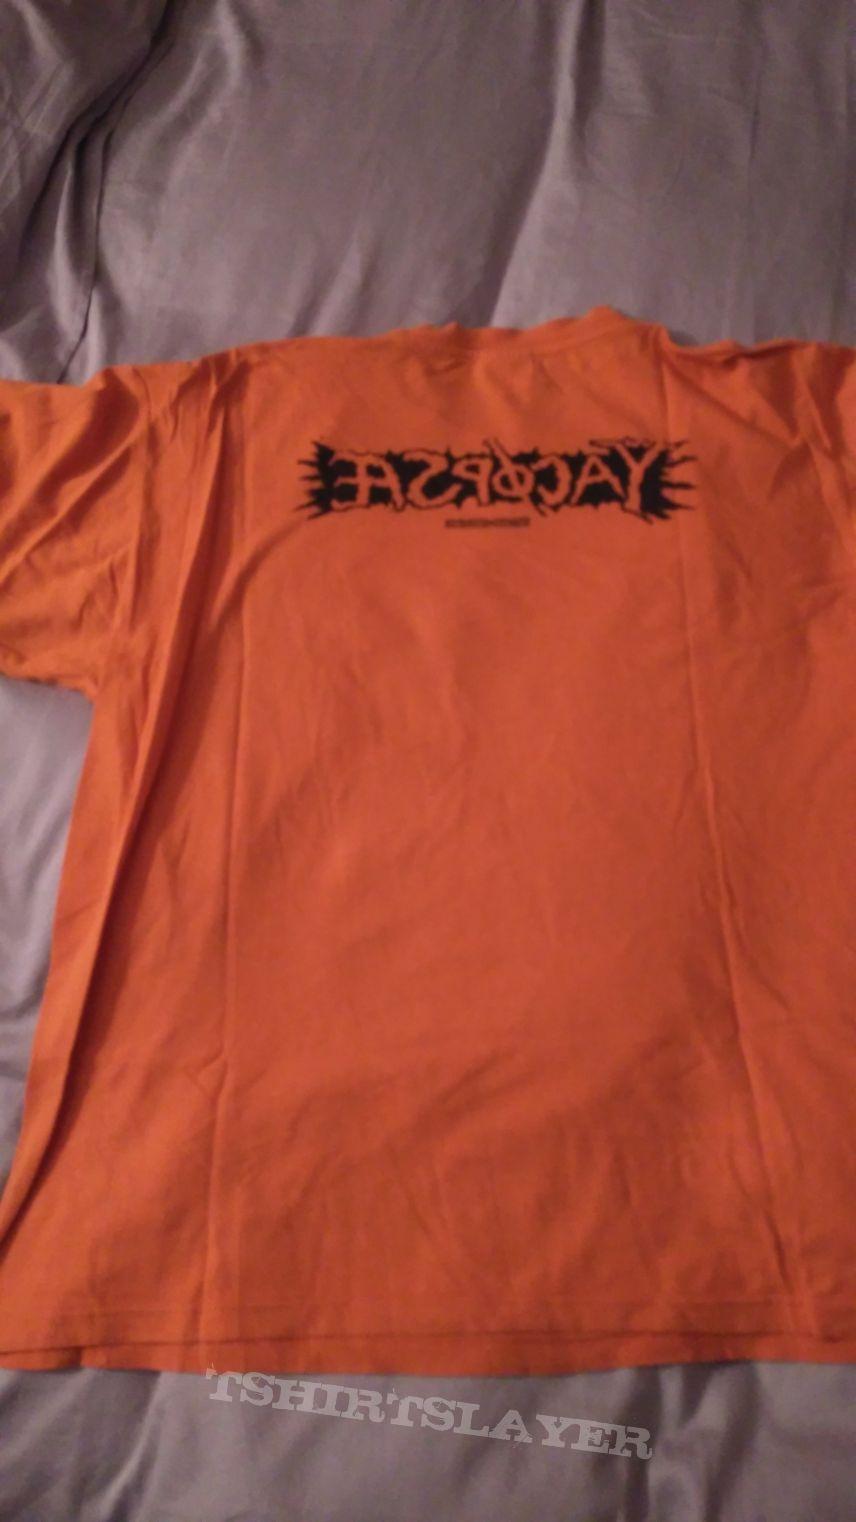 Yacopsae orange